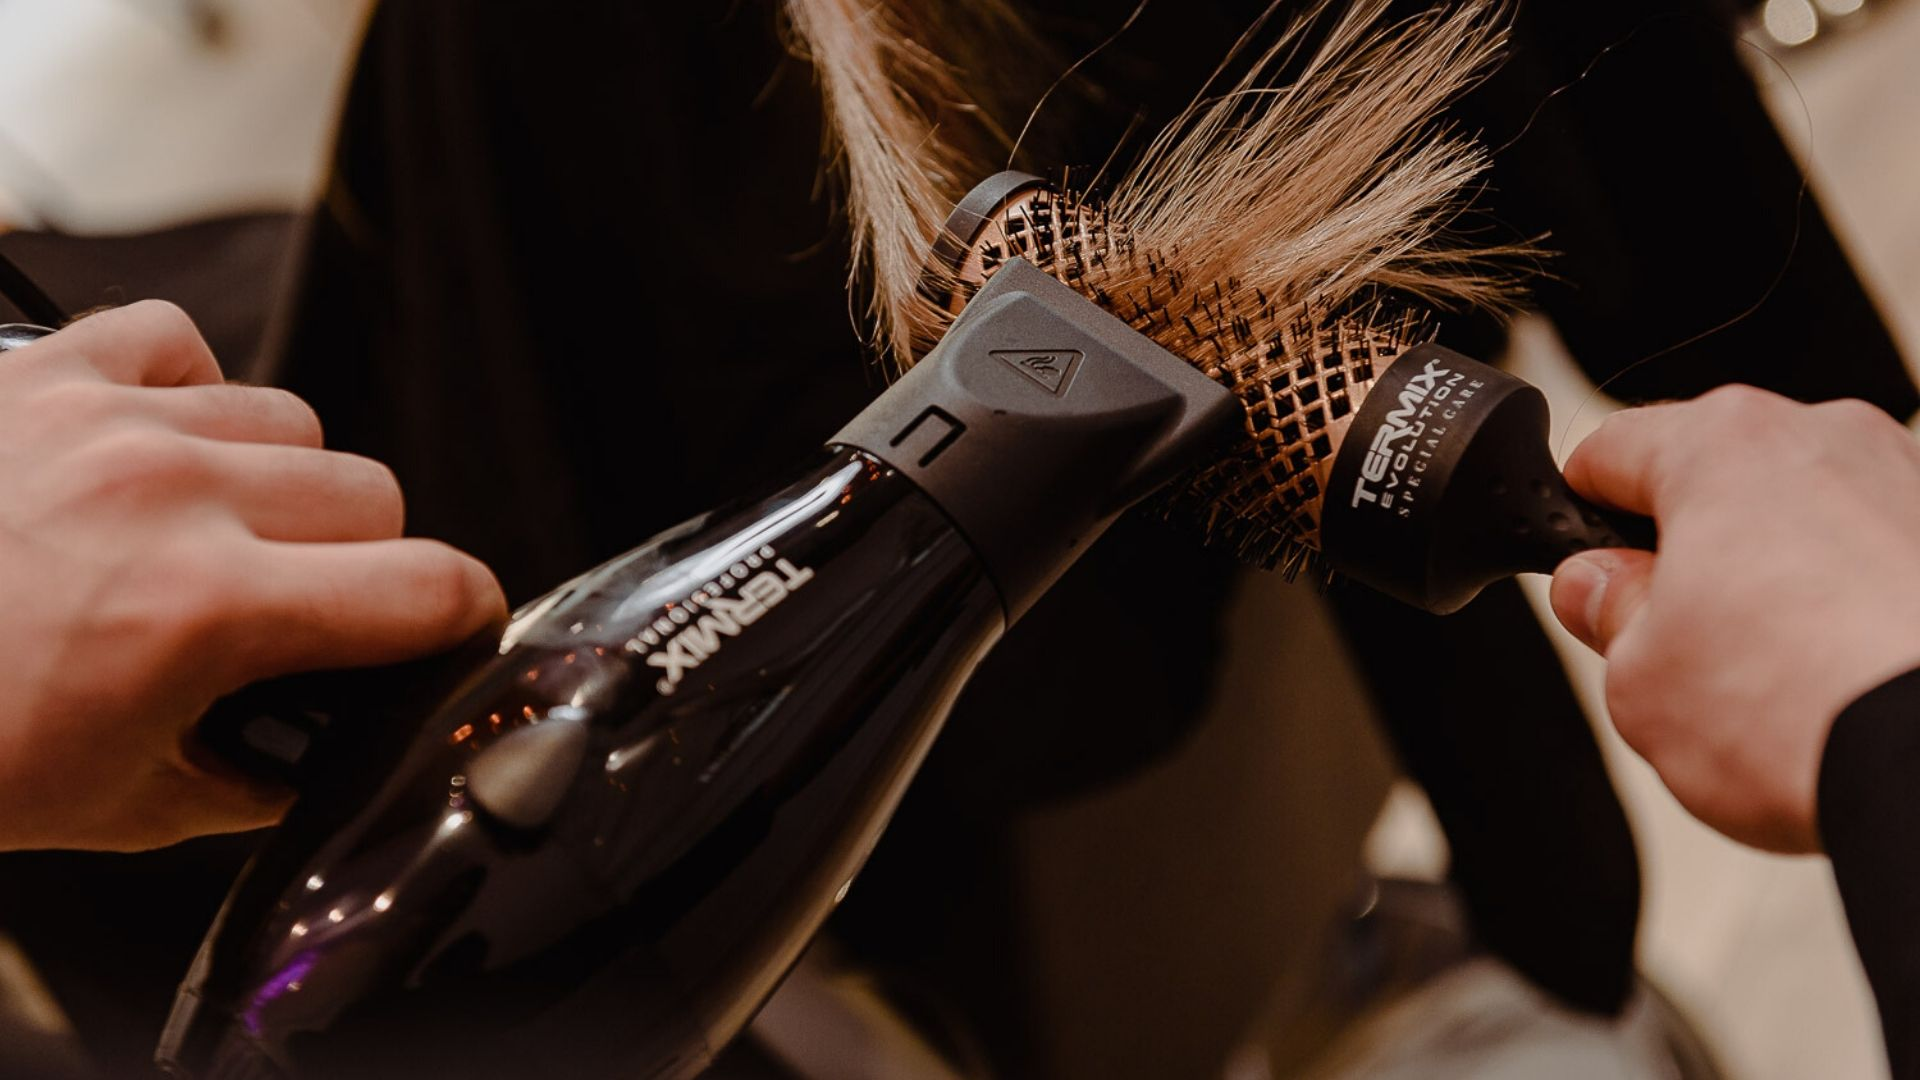 secador de pelo secarse el cabello